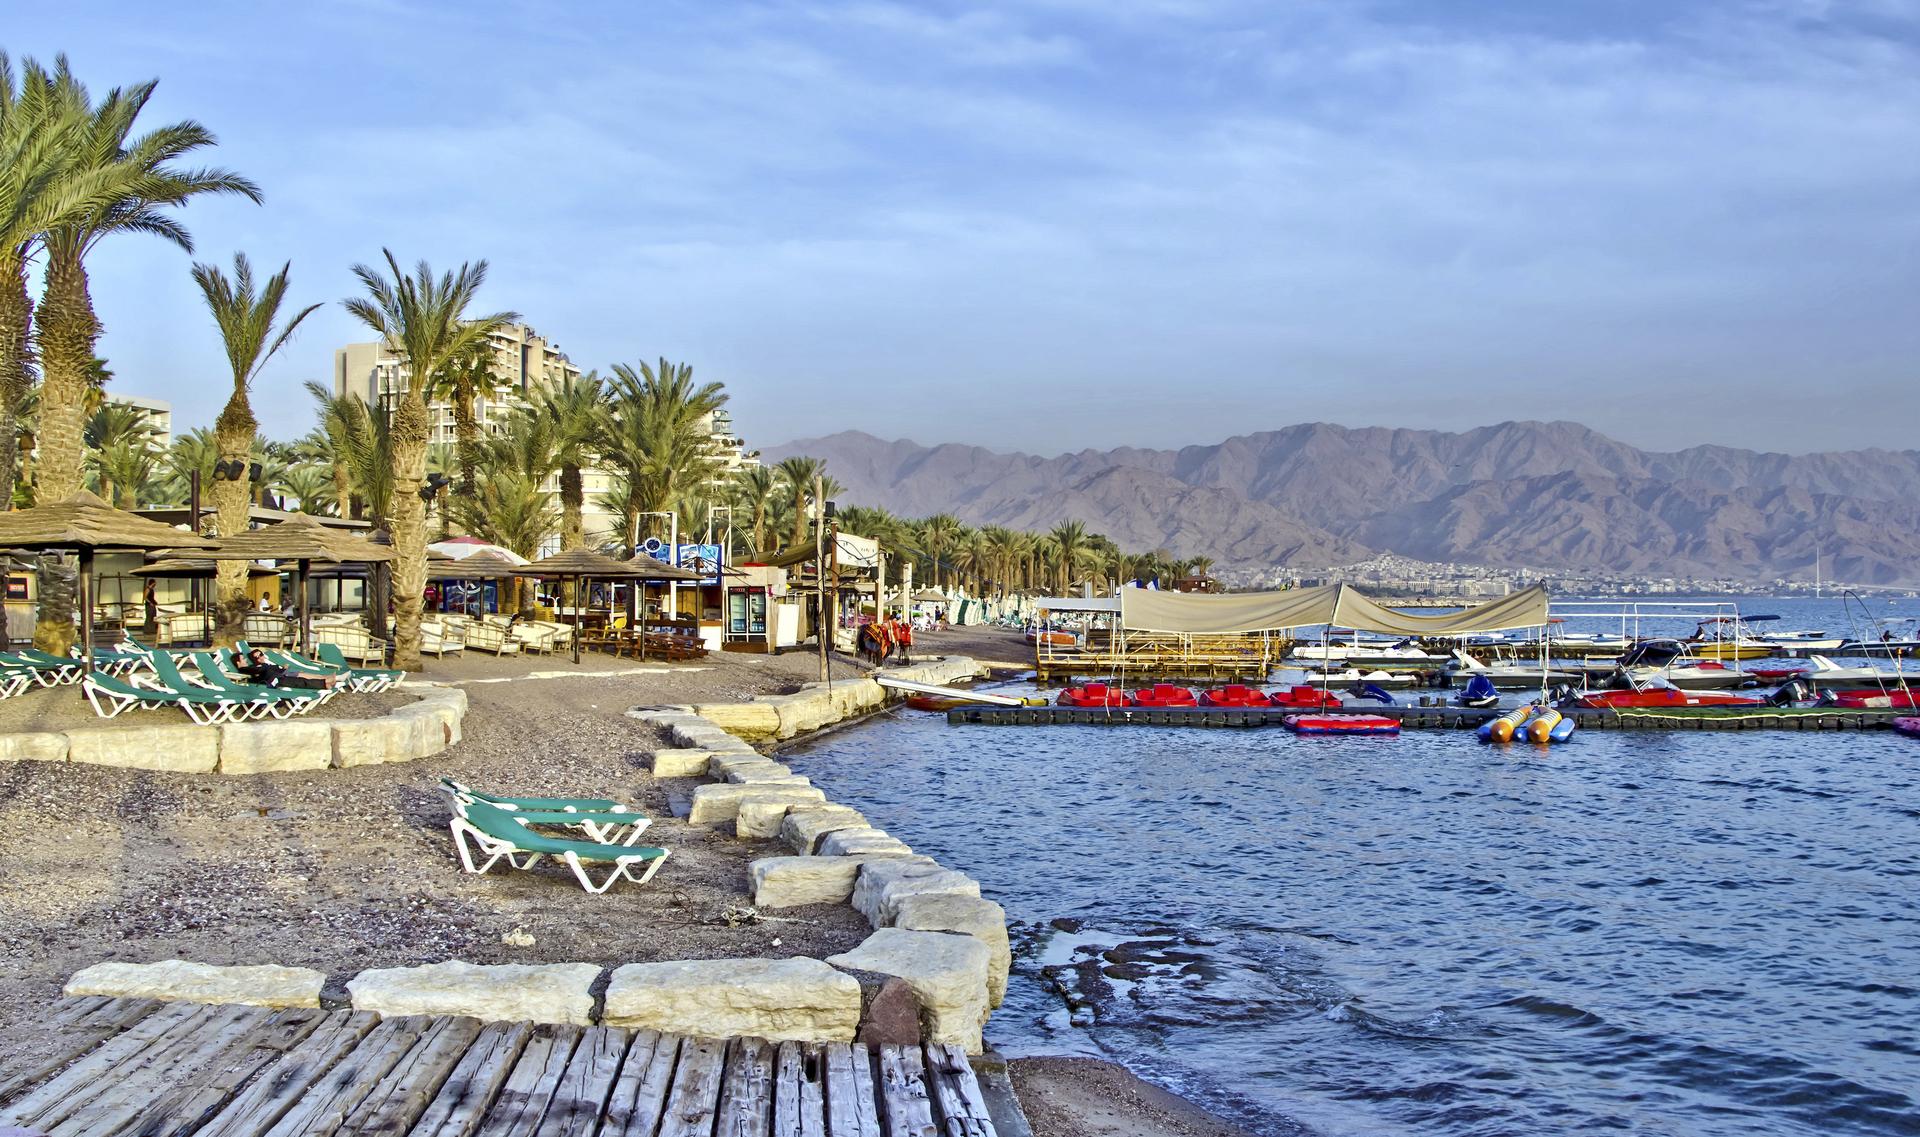 Noord strand met watersport activiteiten, Eilat, Israël